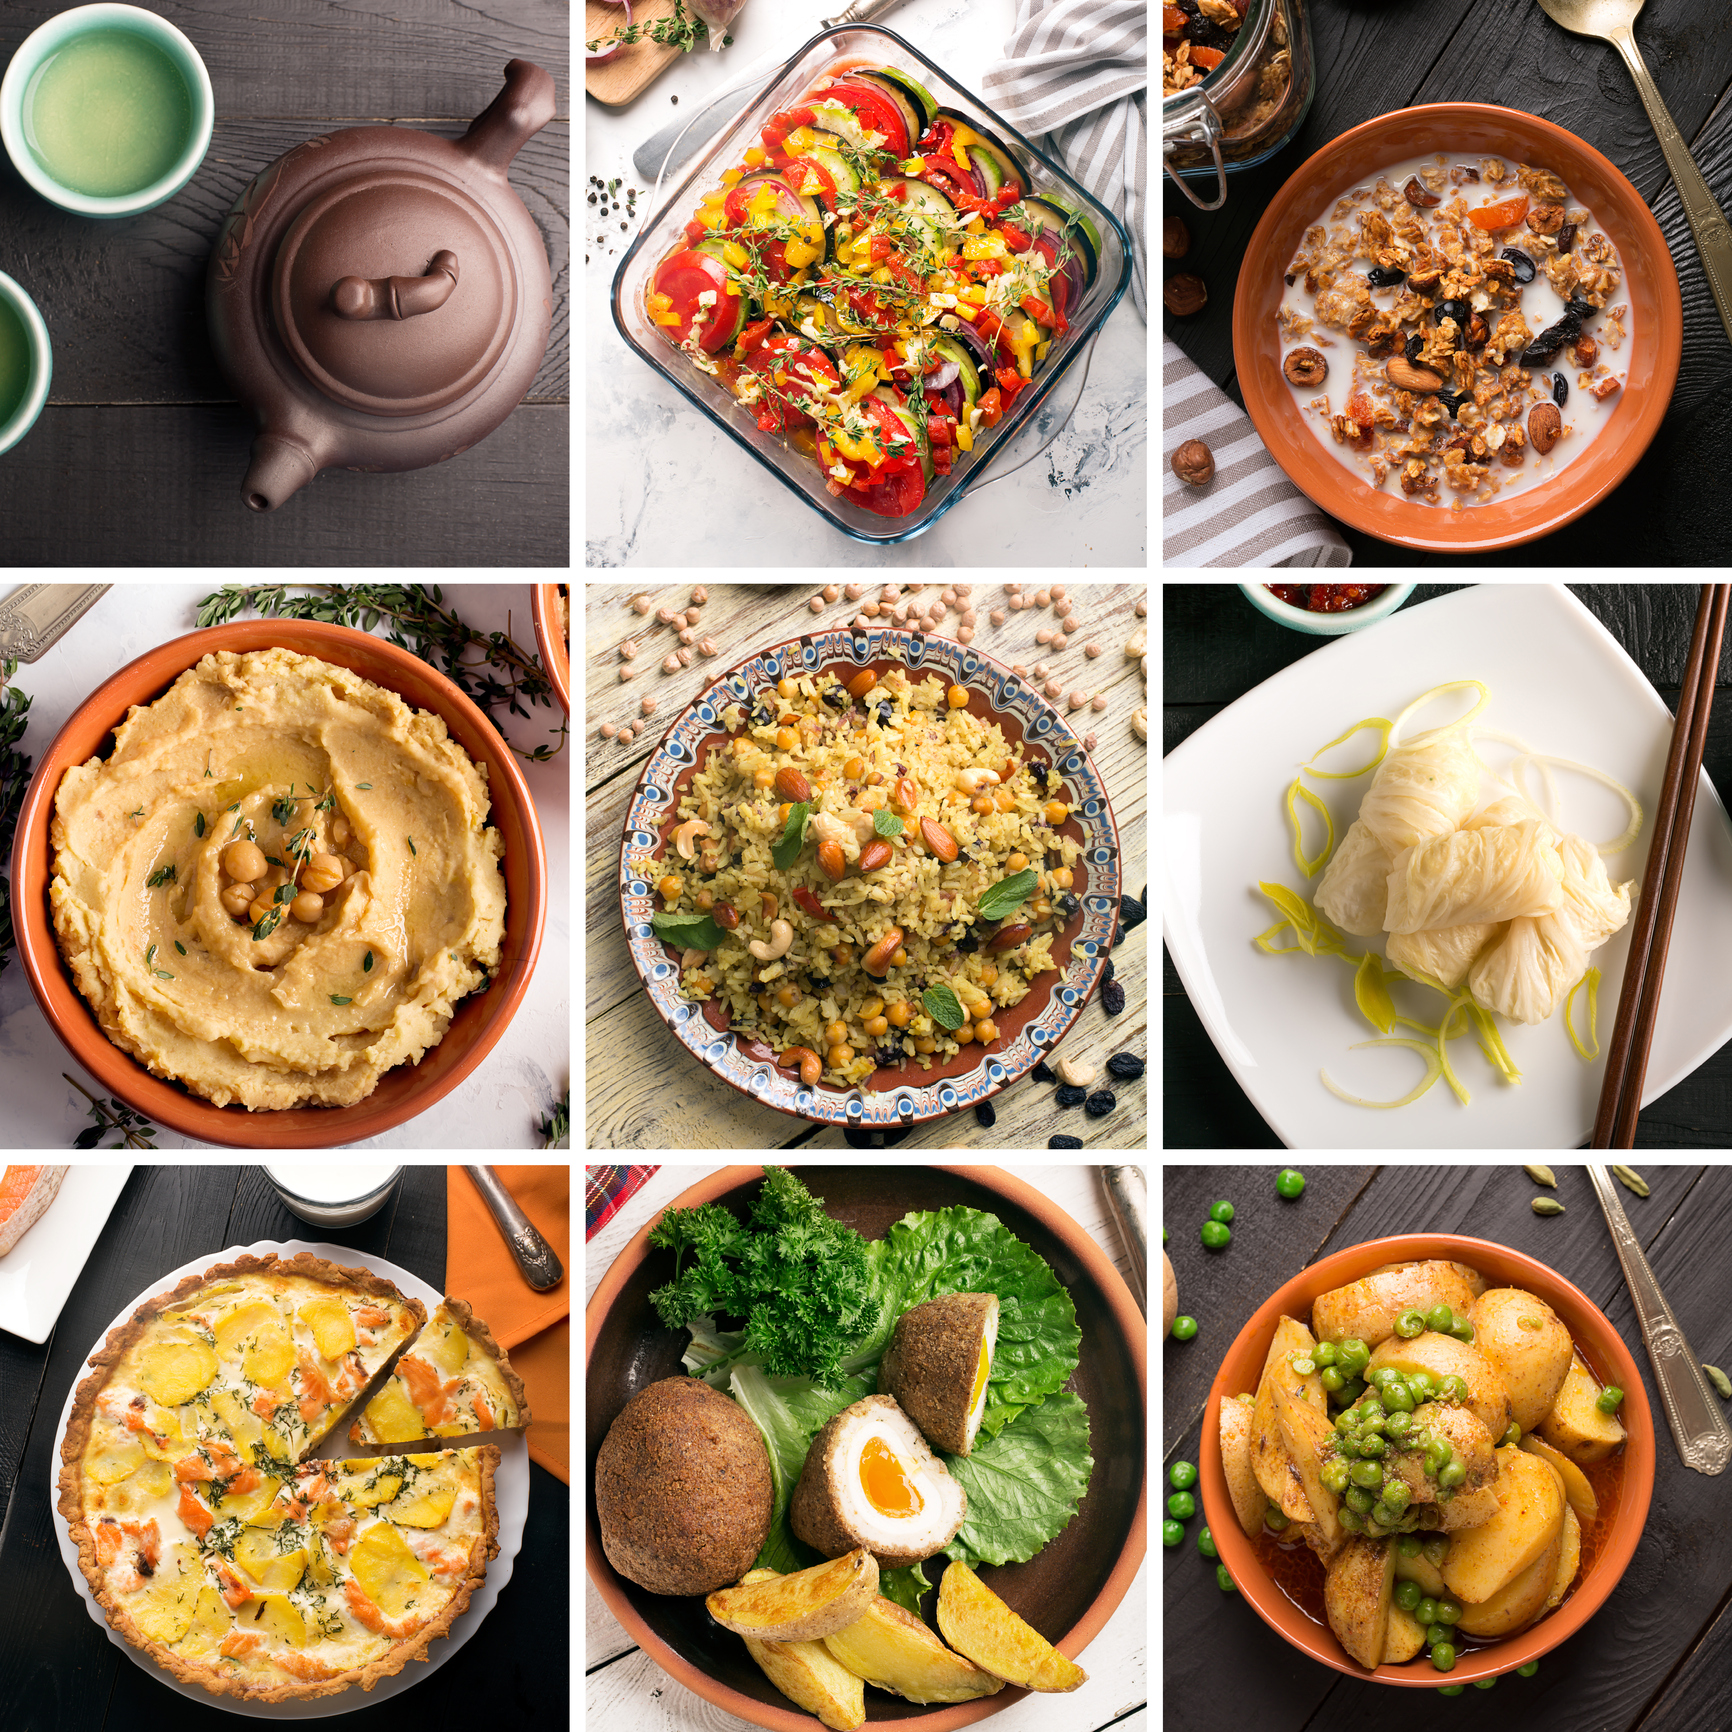 Types Of Food Lovetoknow